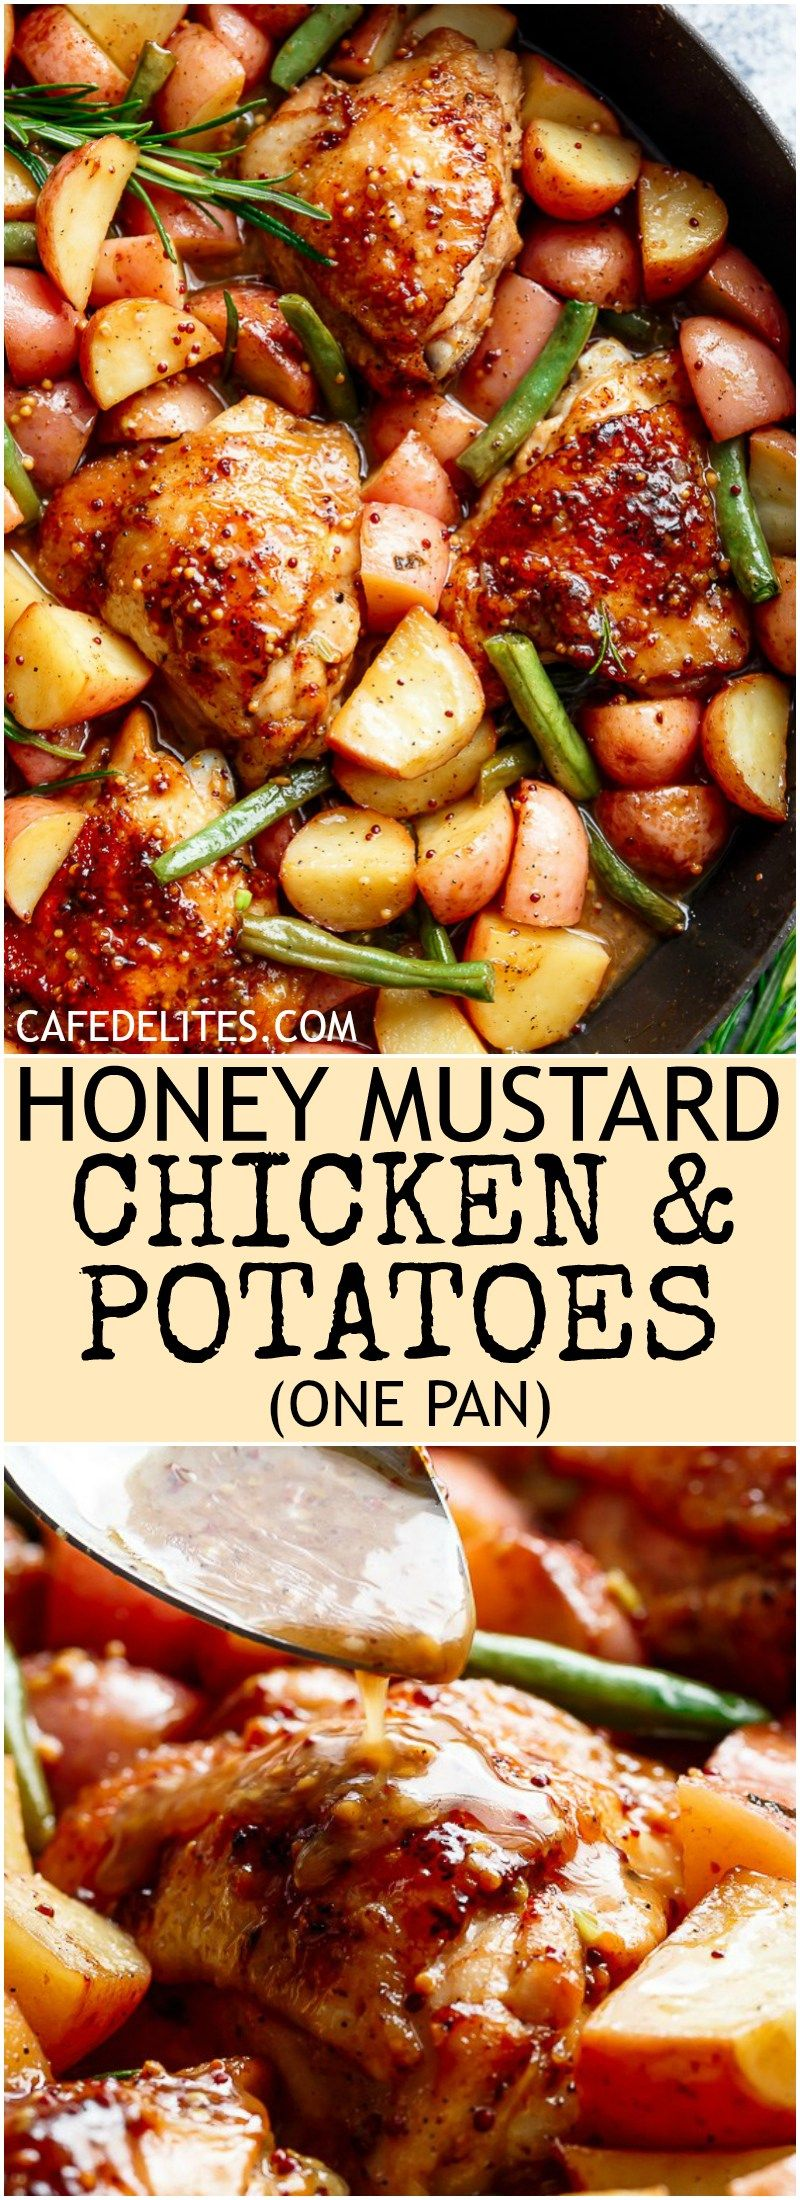 Minute Meal Mel S Kitchen Cafe